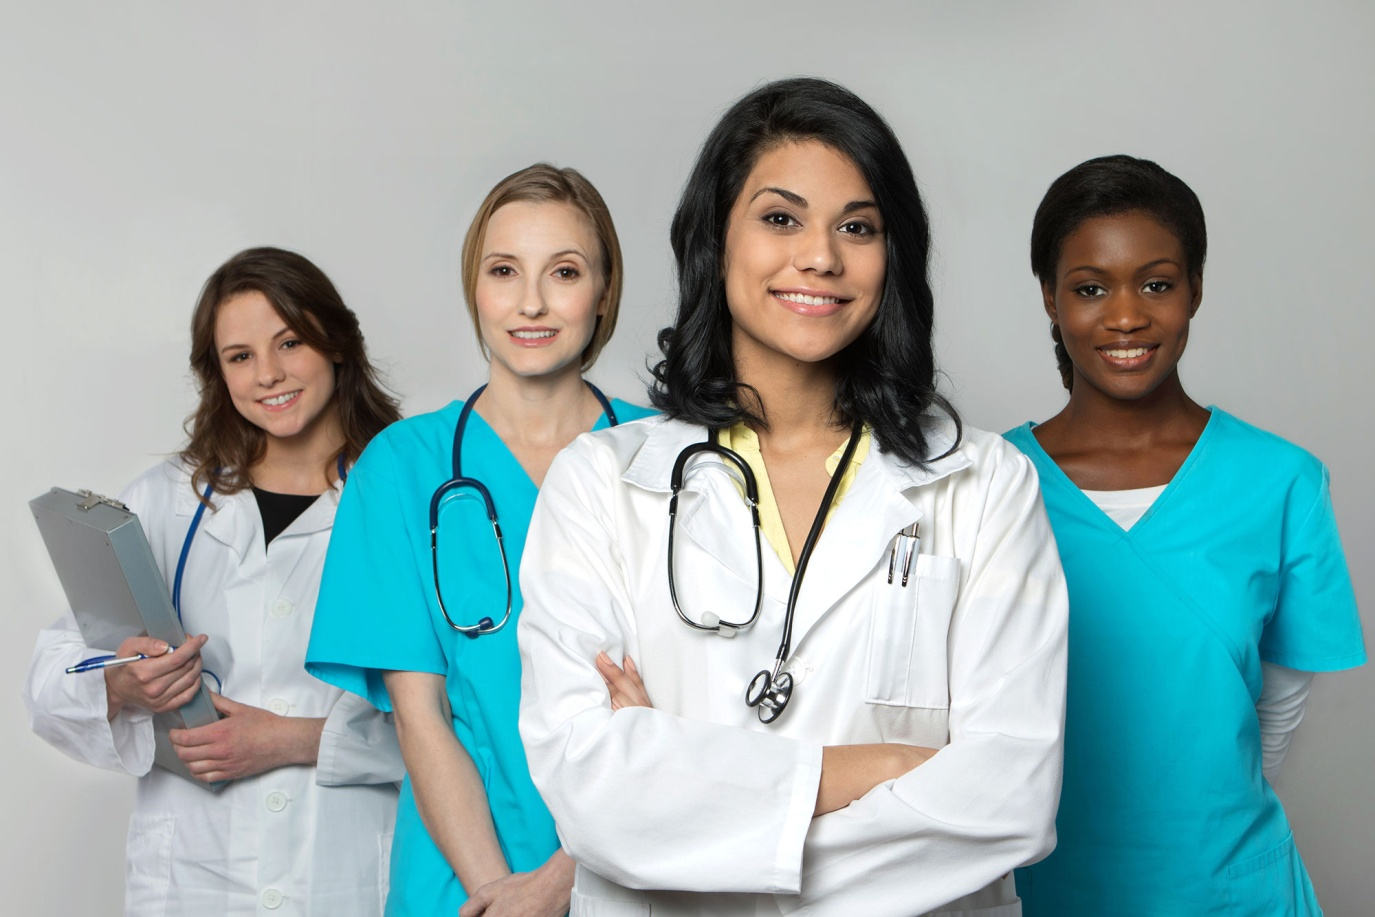 C:\Users\Korisnik\Desktop\Medicare-Solutions-for-Health-Care-Providers.jpg